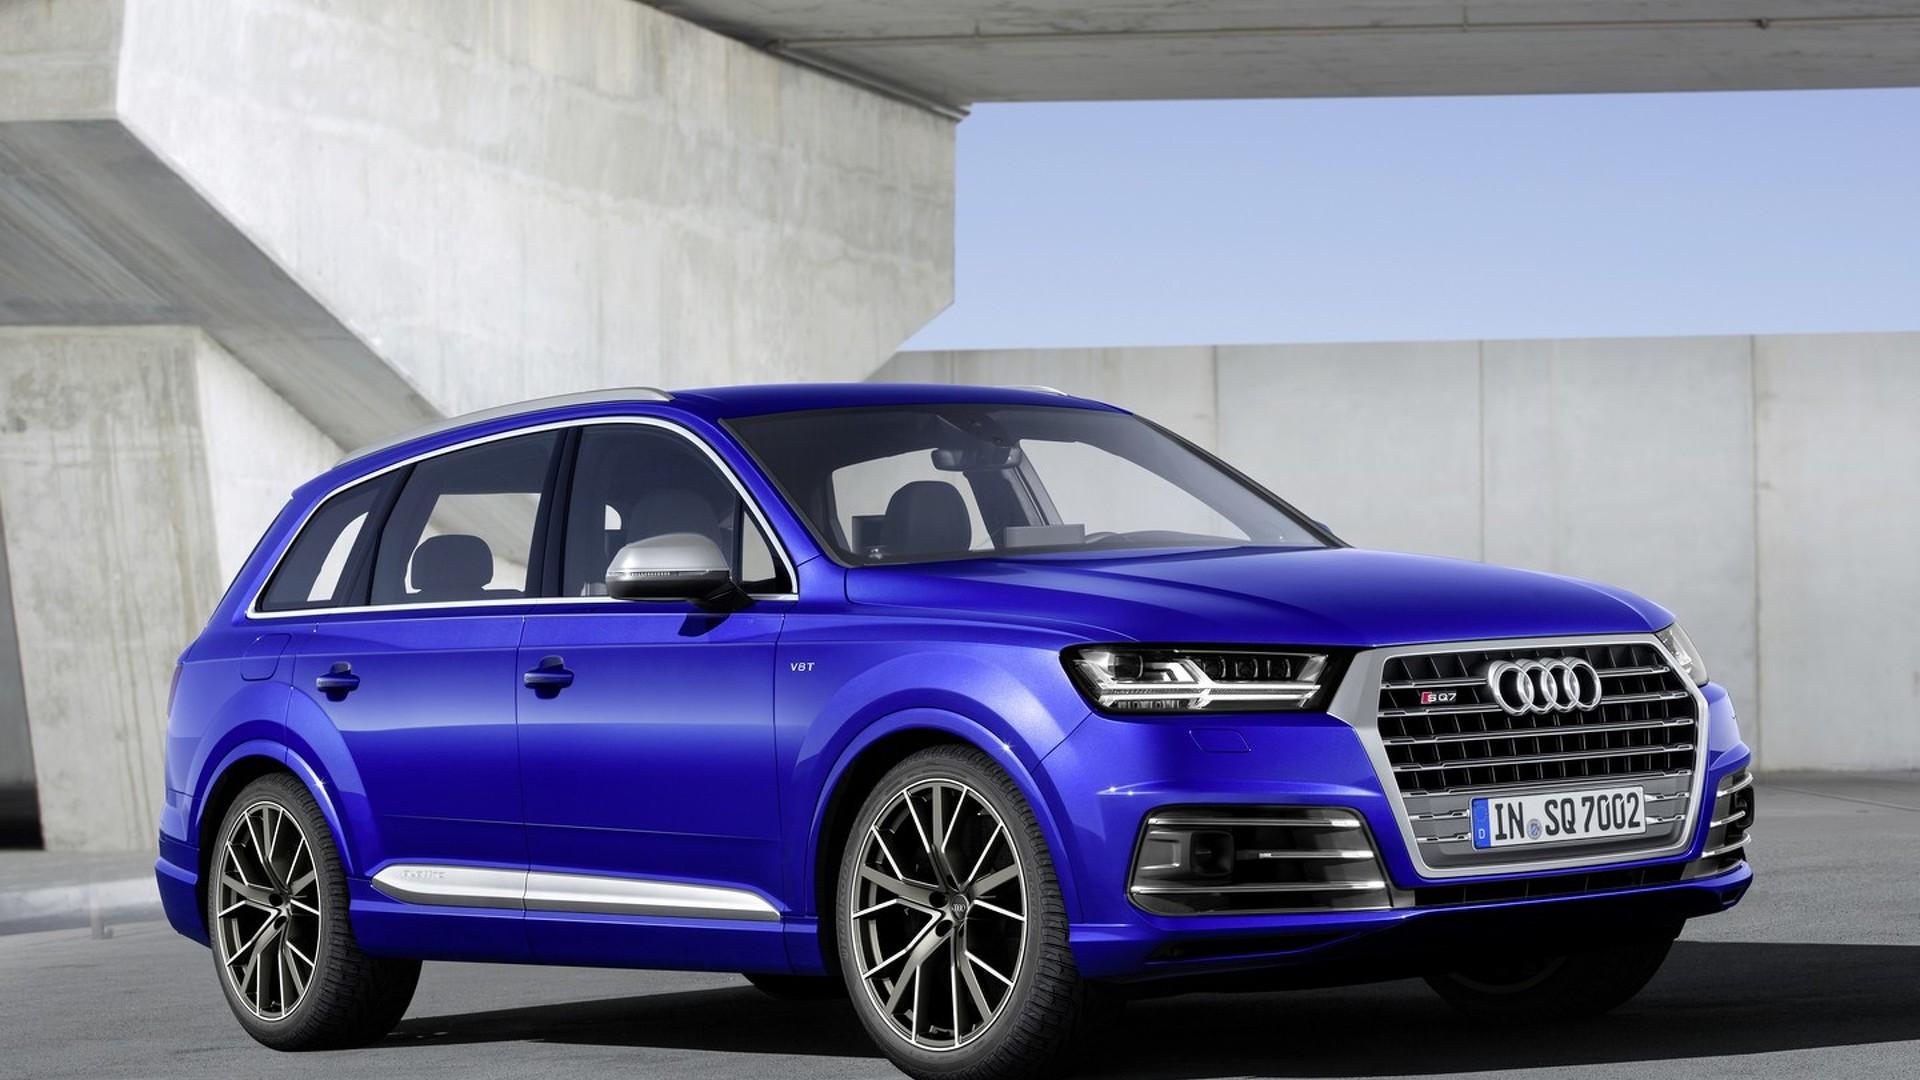 Audi Sq7 Usa Release >> Diesel Duel Audi Sq7 Versus Porsche Panamera 4s In Drag Race